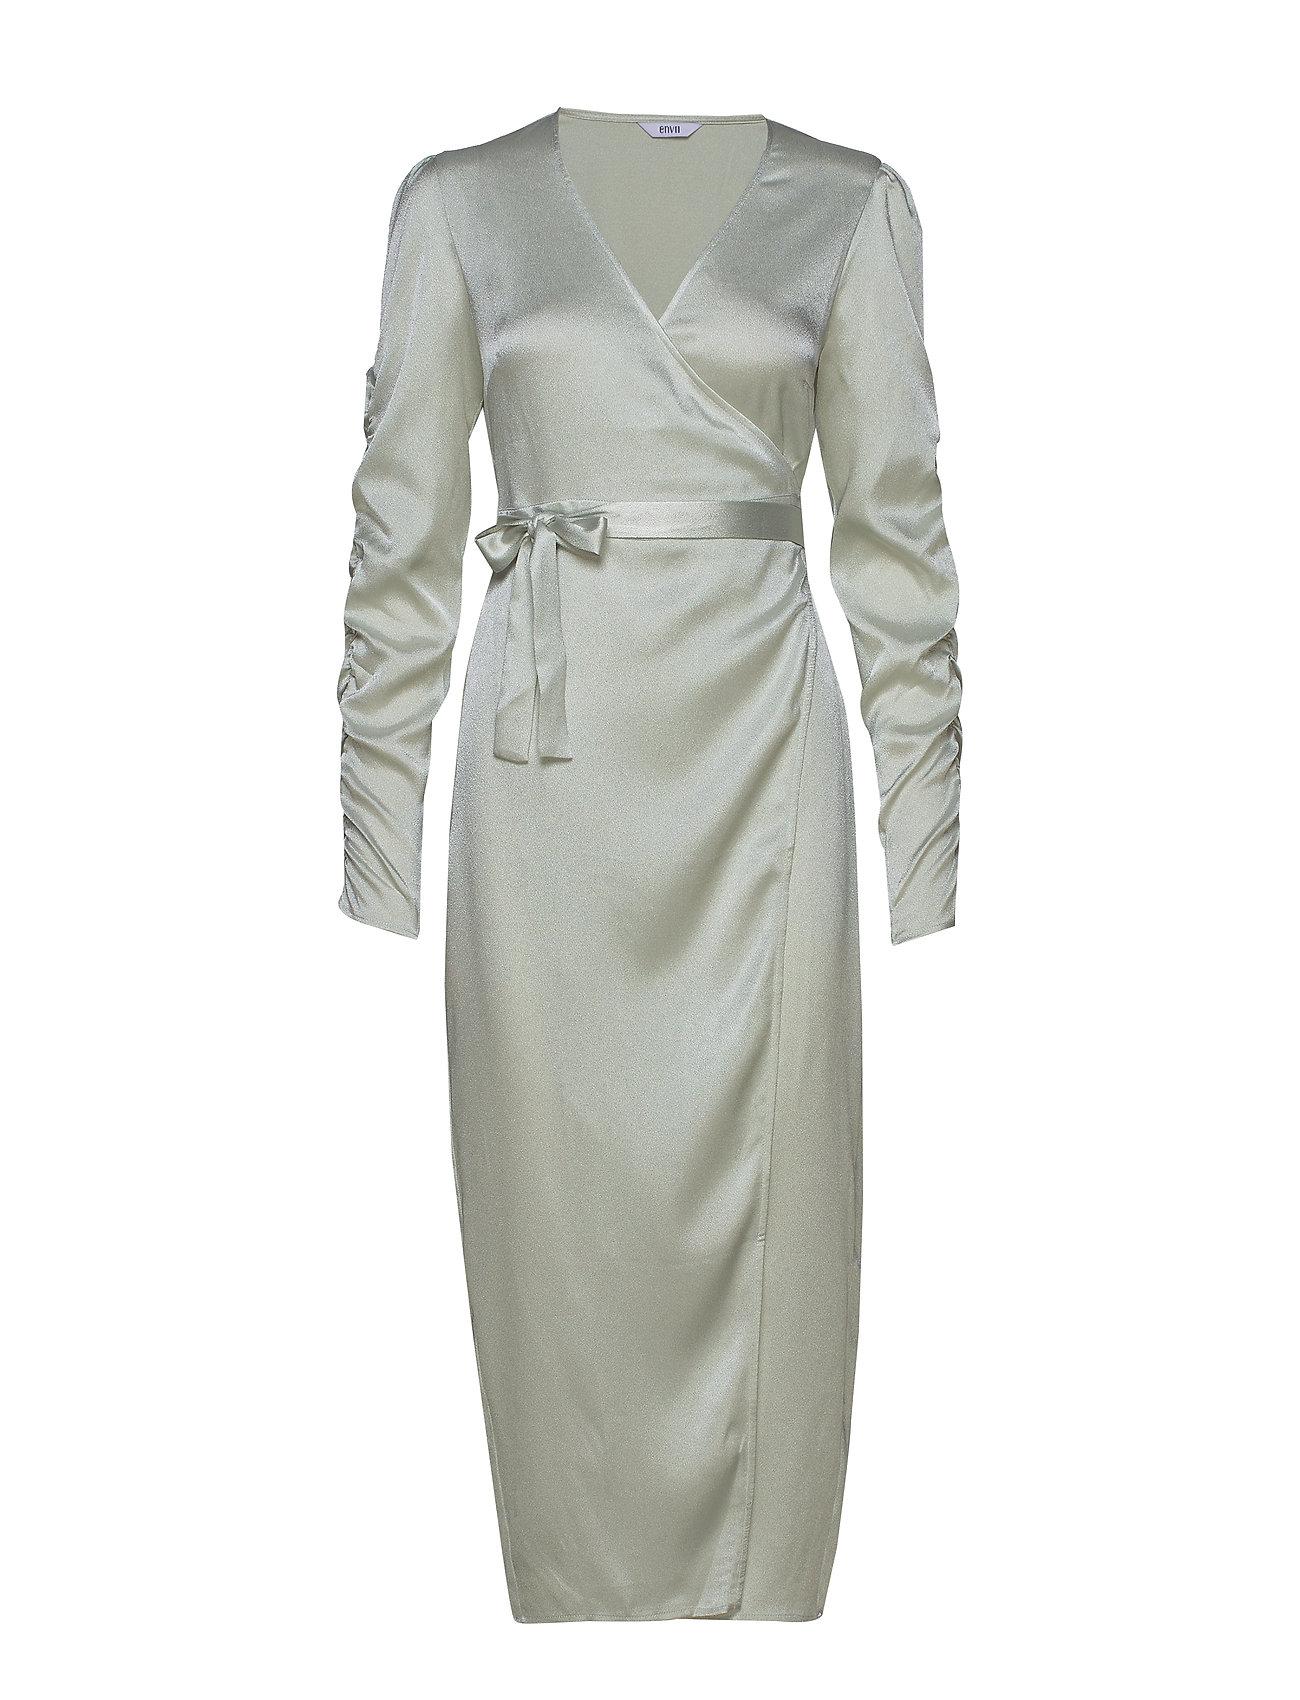 Envii ENBIANCA LS DRESS 6613 - CHAMPAGNE SHINE